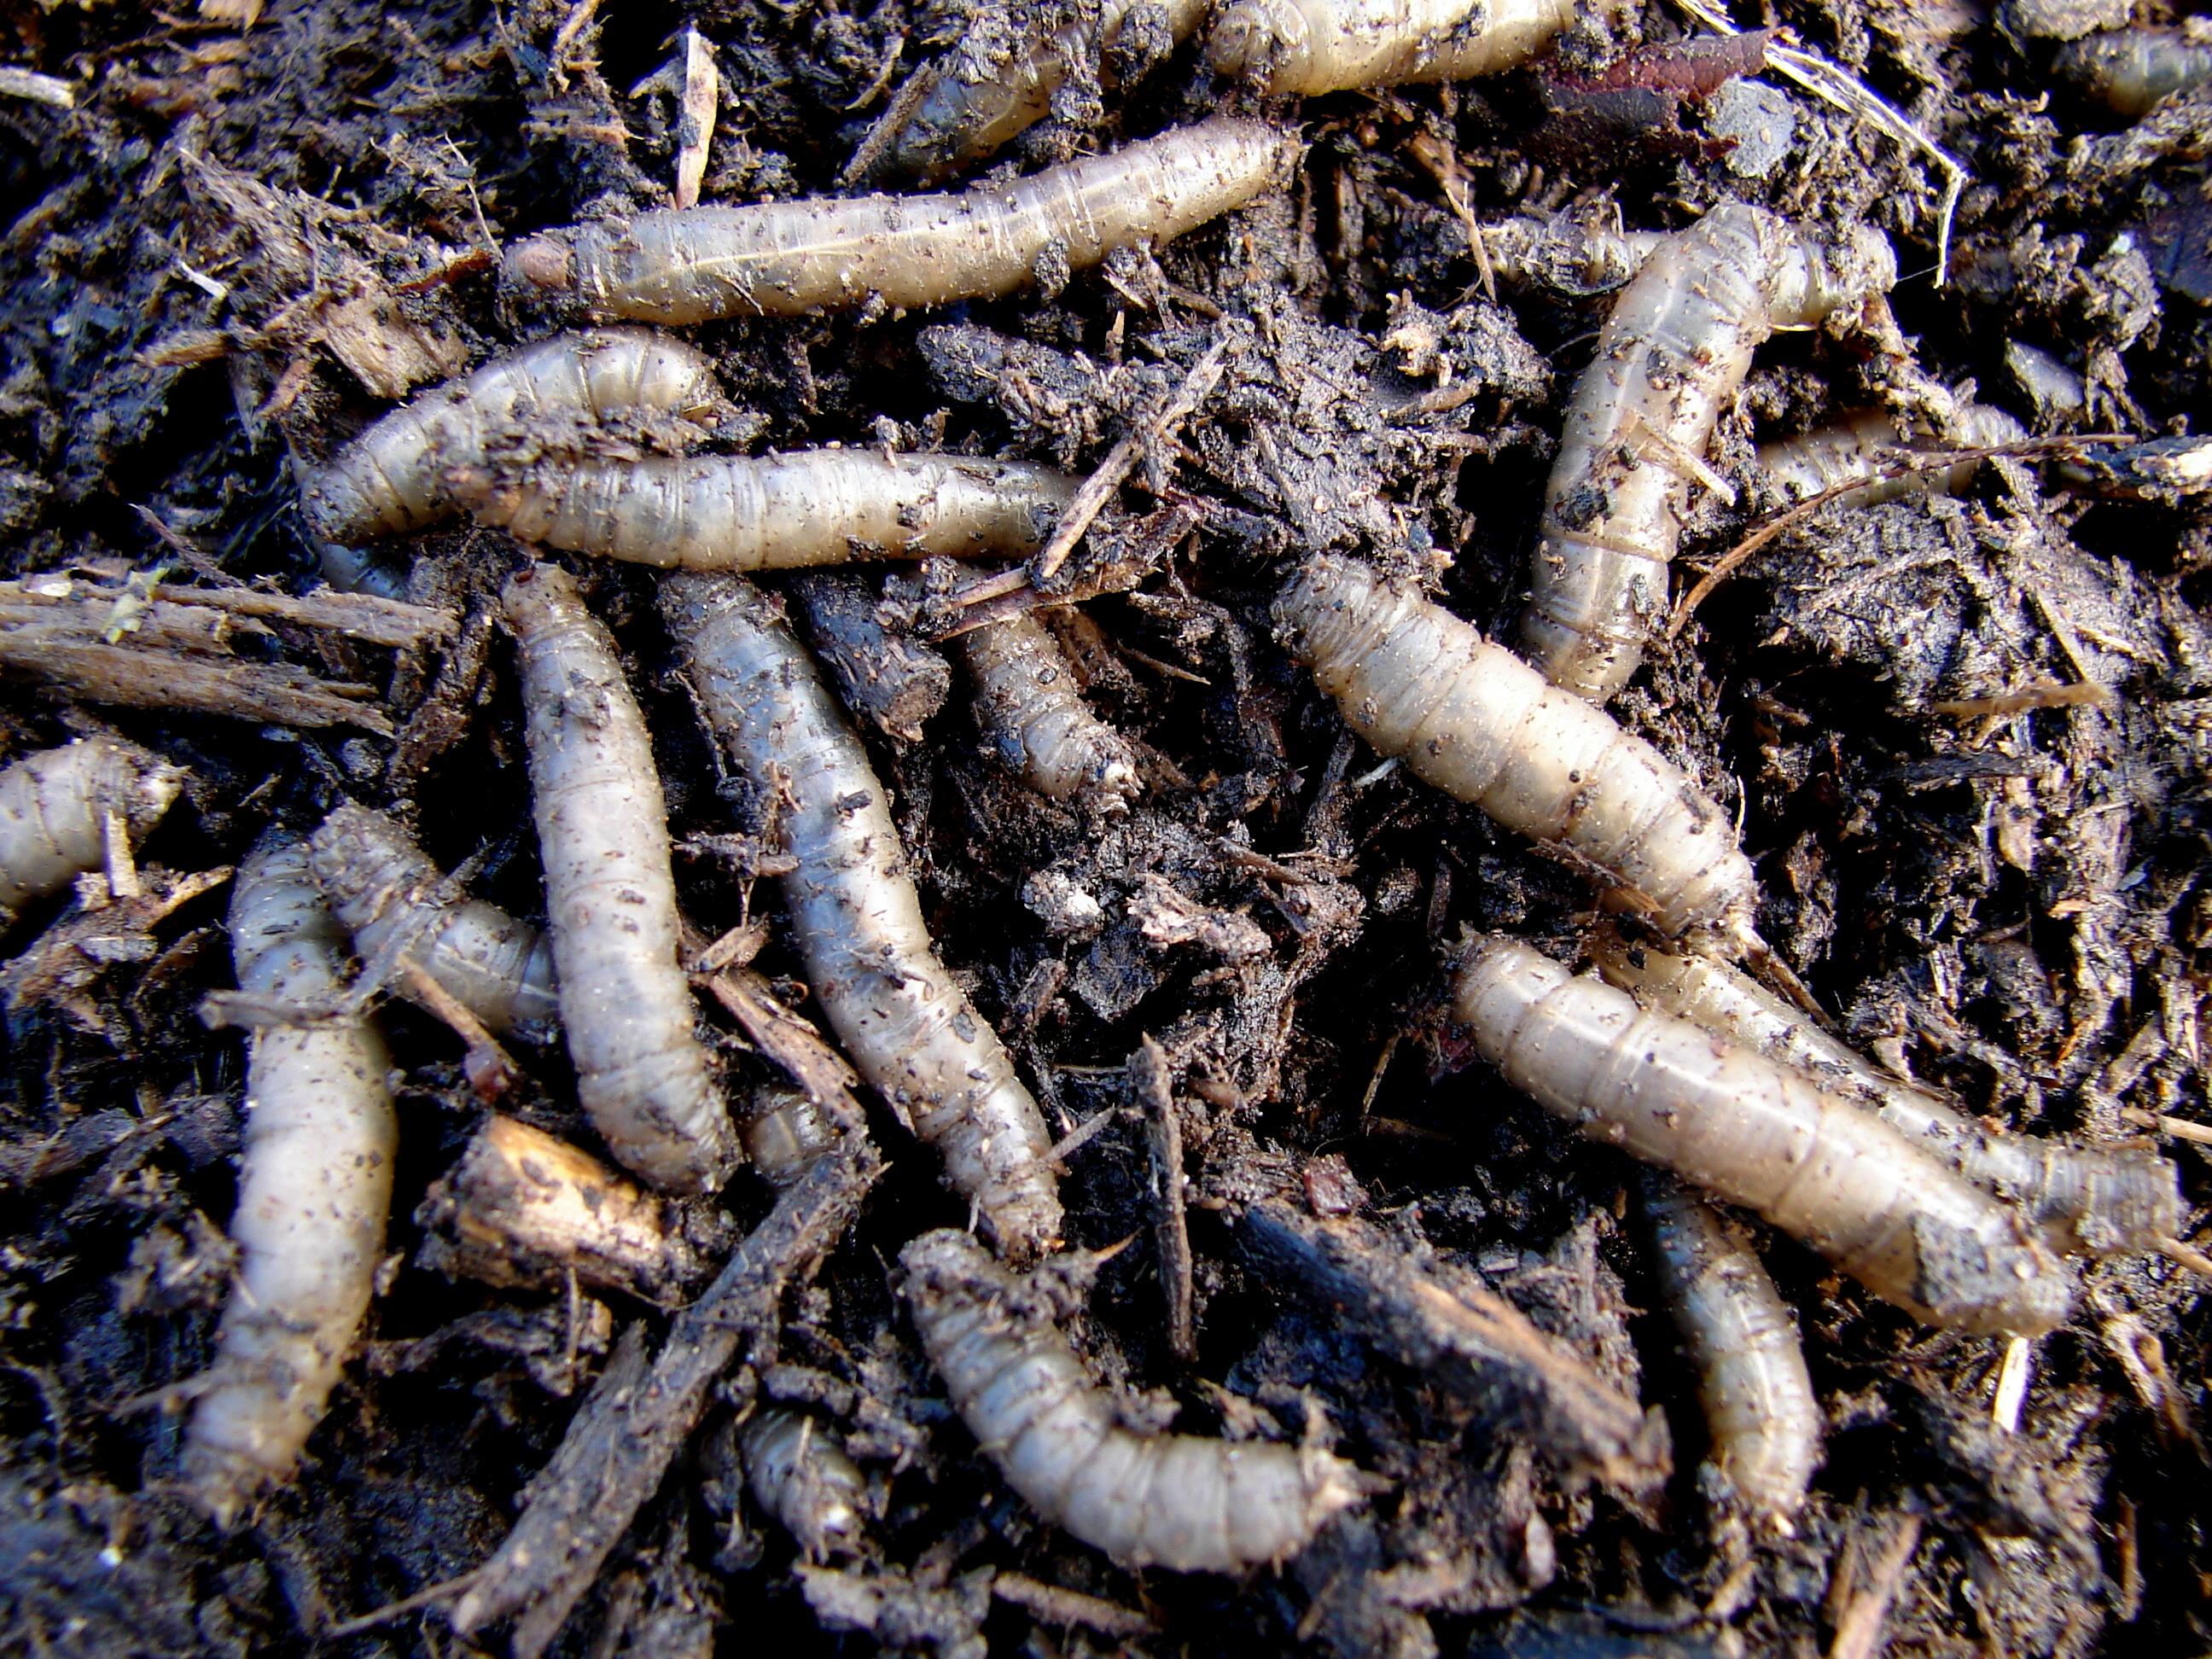 A group of gray maggots